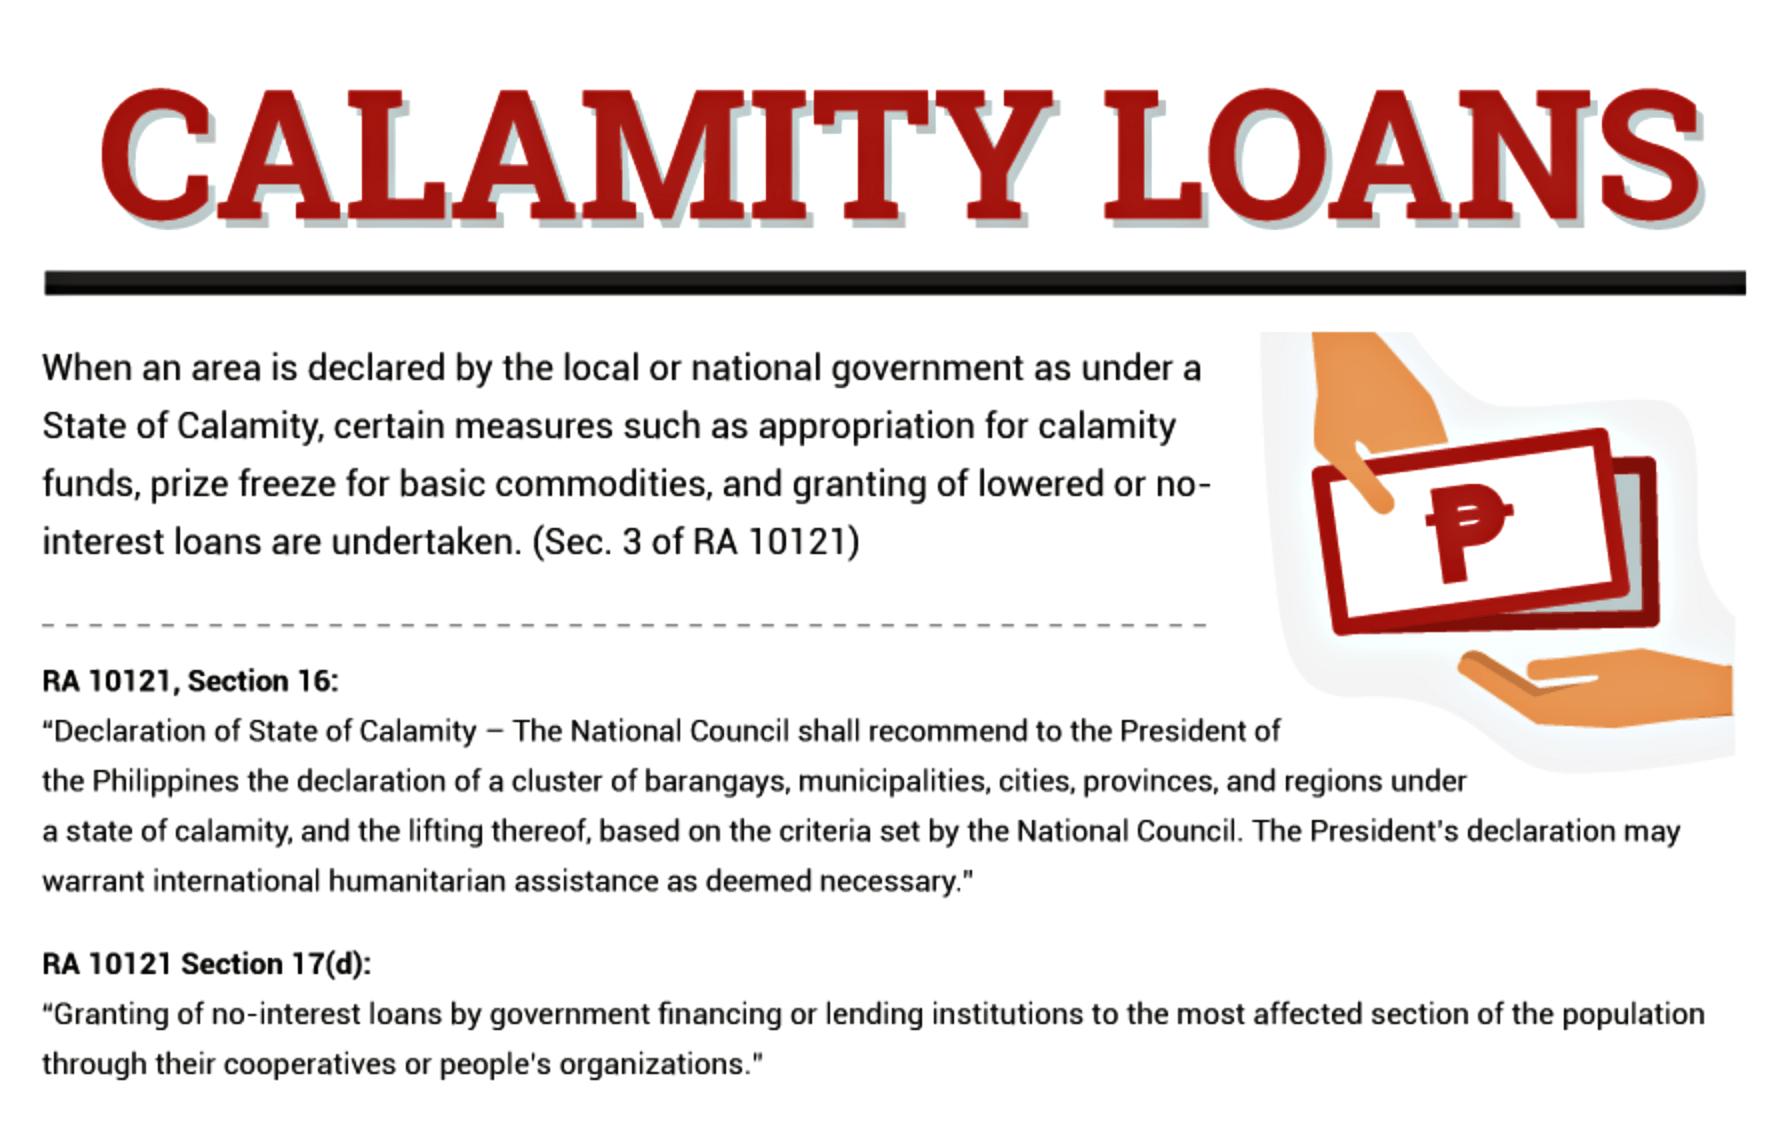 Pag-ibig and SSS Calamity Loan